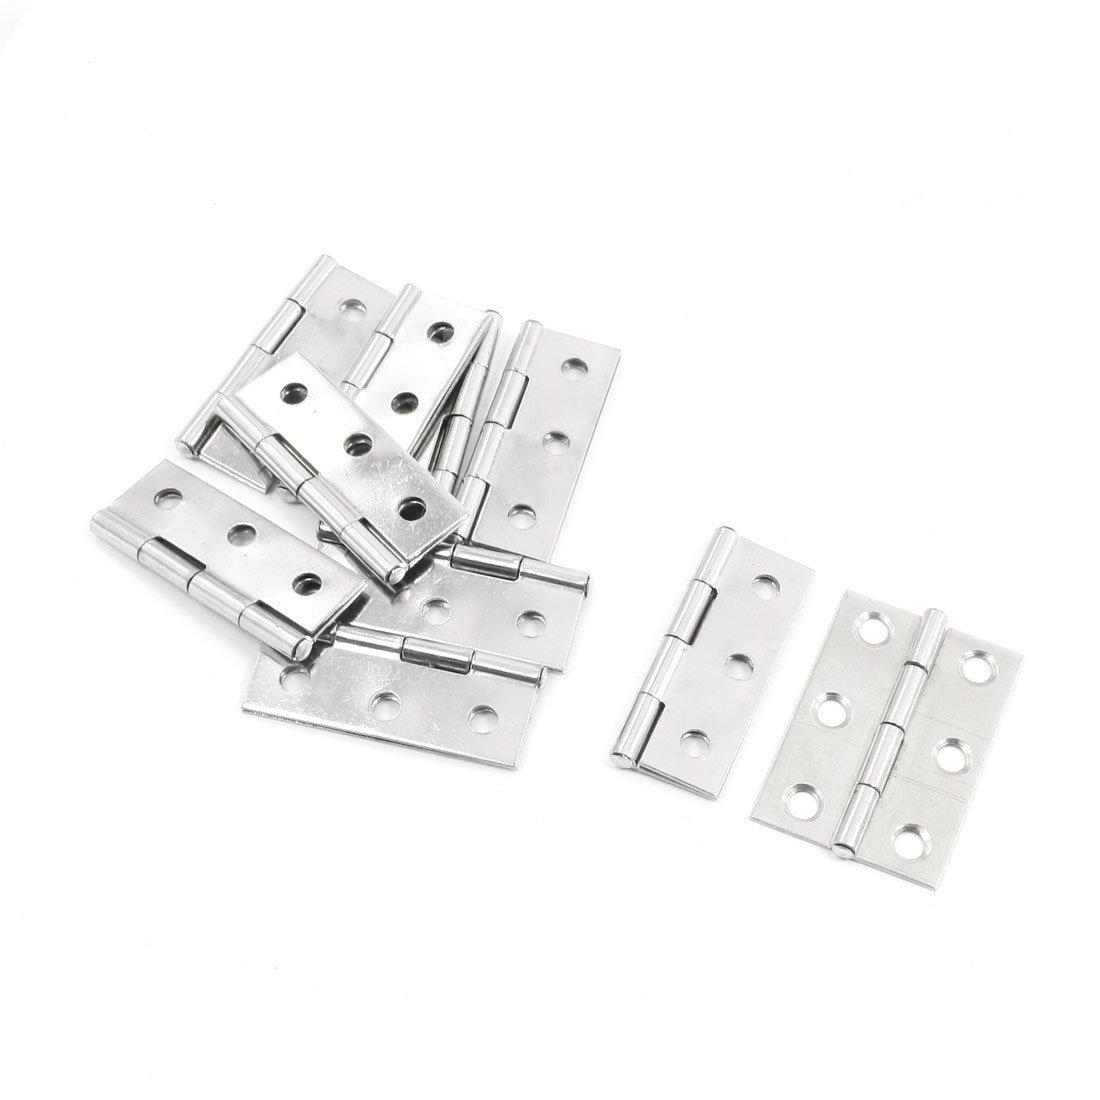 Onwon 10 Pcs Folding Butt Hinges Silver Tone Home Furniture Hardware Door Hinge VNDEFUL